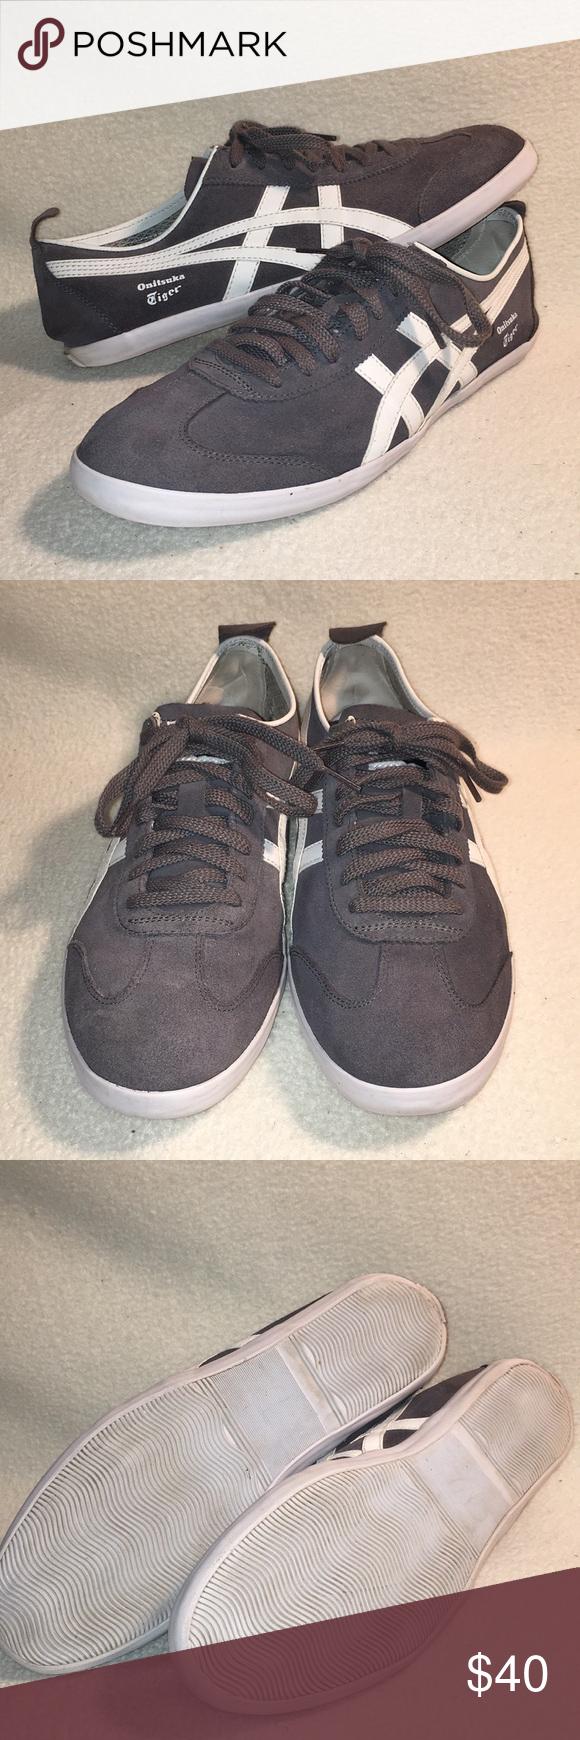 wholesale dealer eb736 43b79 Onitsuka tiger Mexico 66 sneaker sz 9.5 grey/white Onitsuka ...